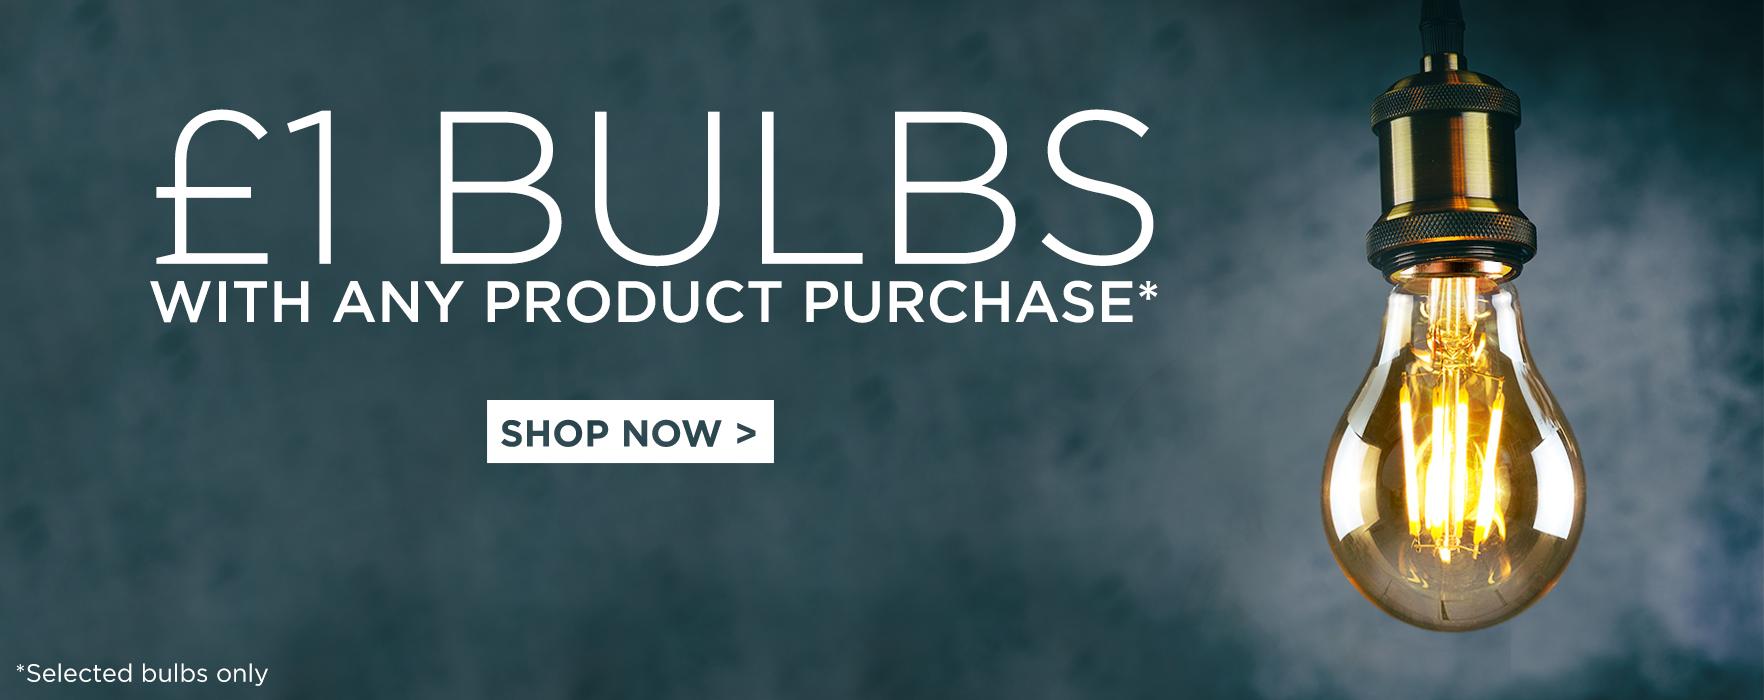 £1 Bulbs Offer 16.11.18